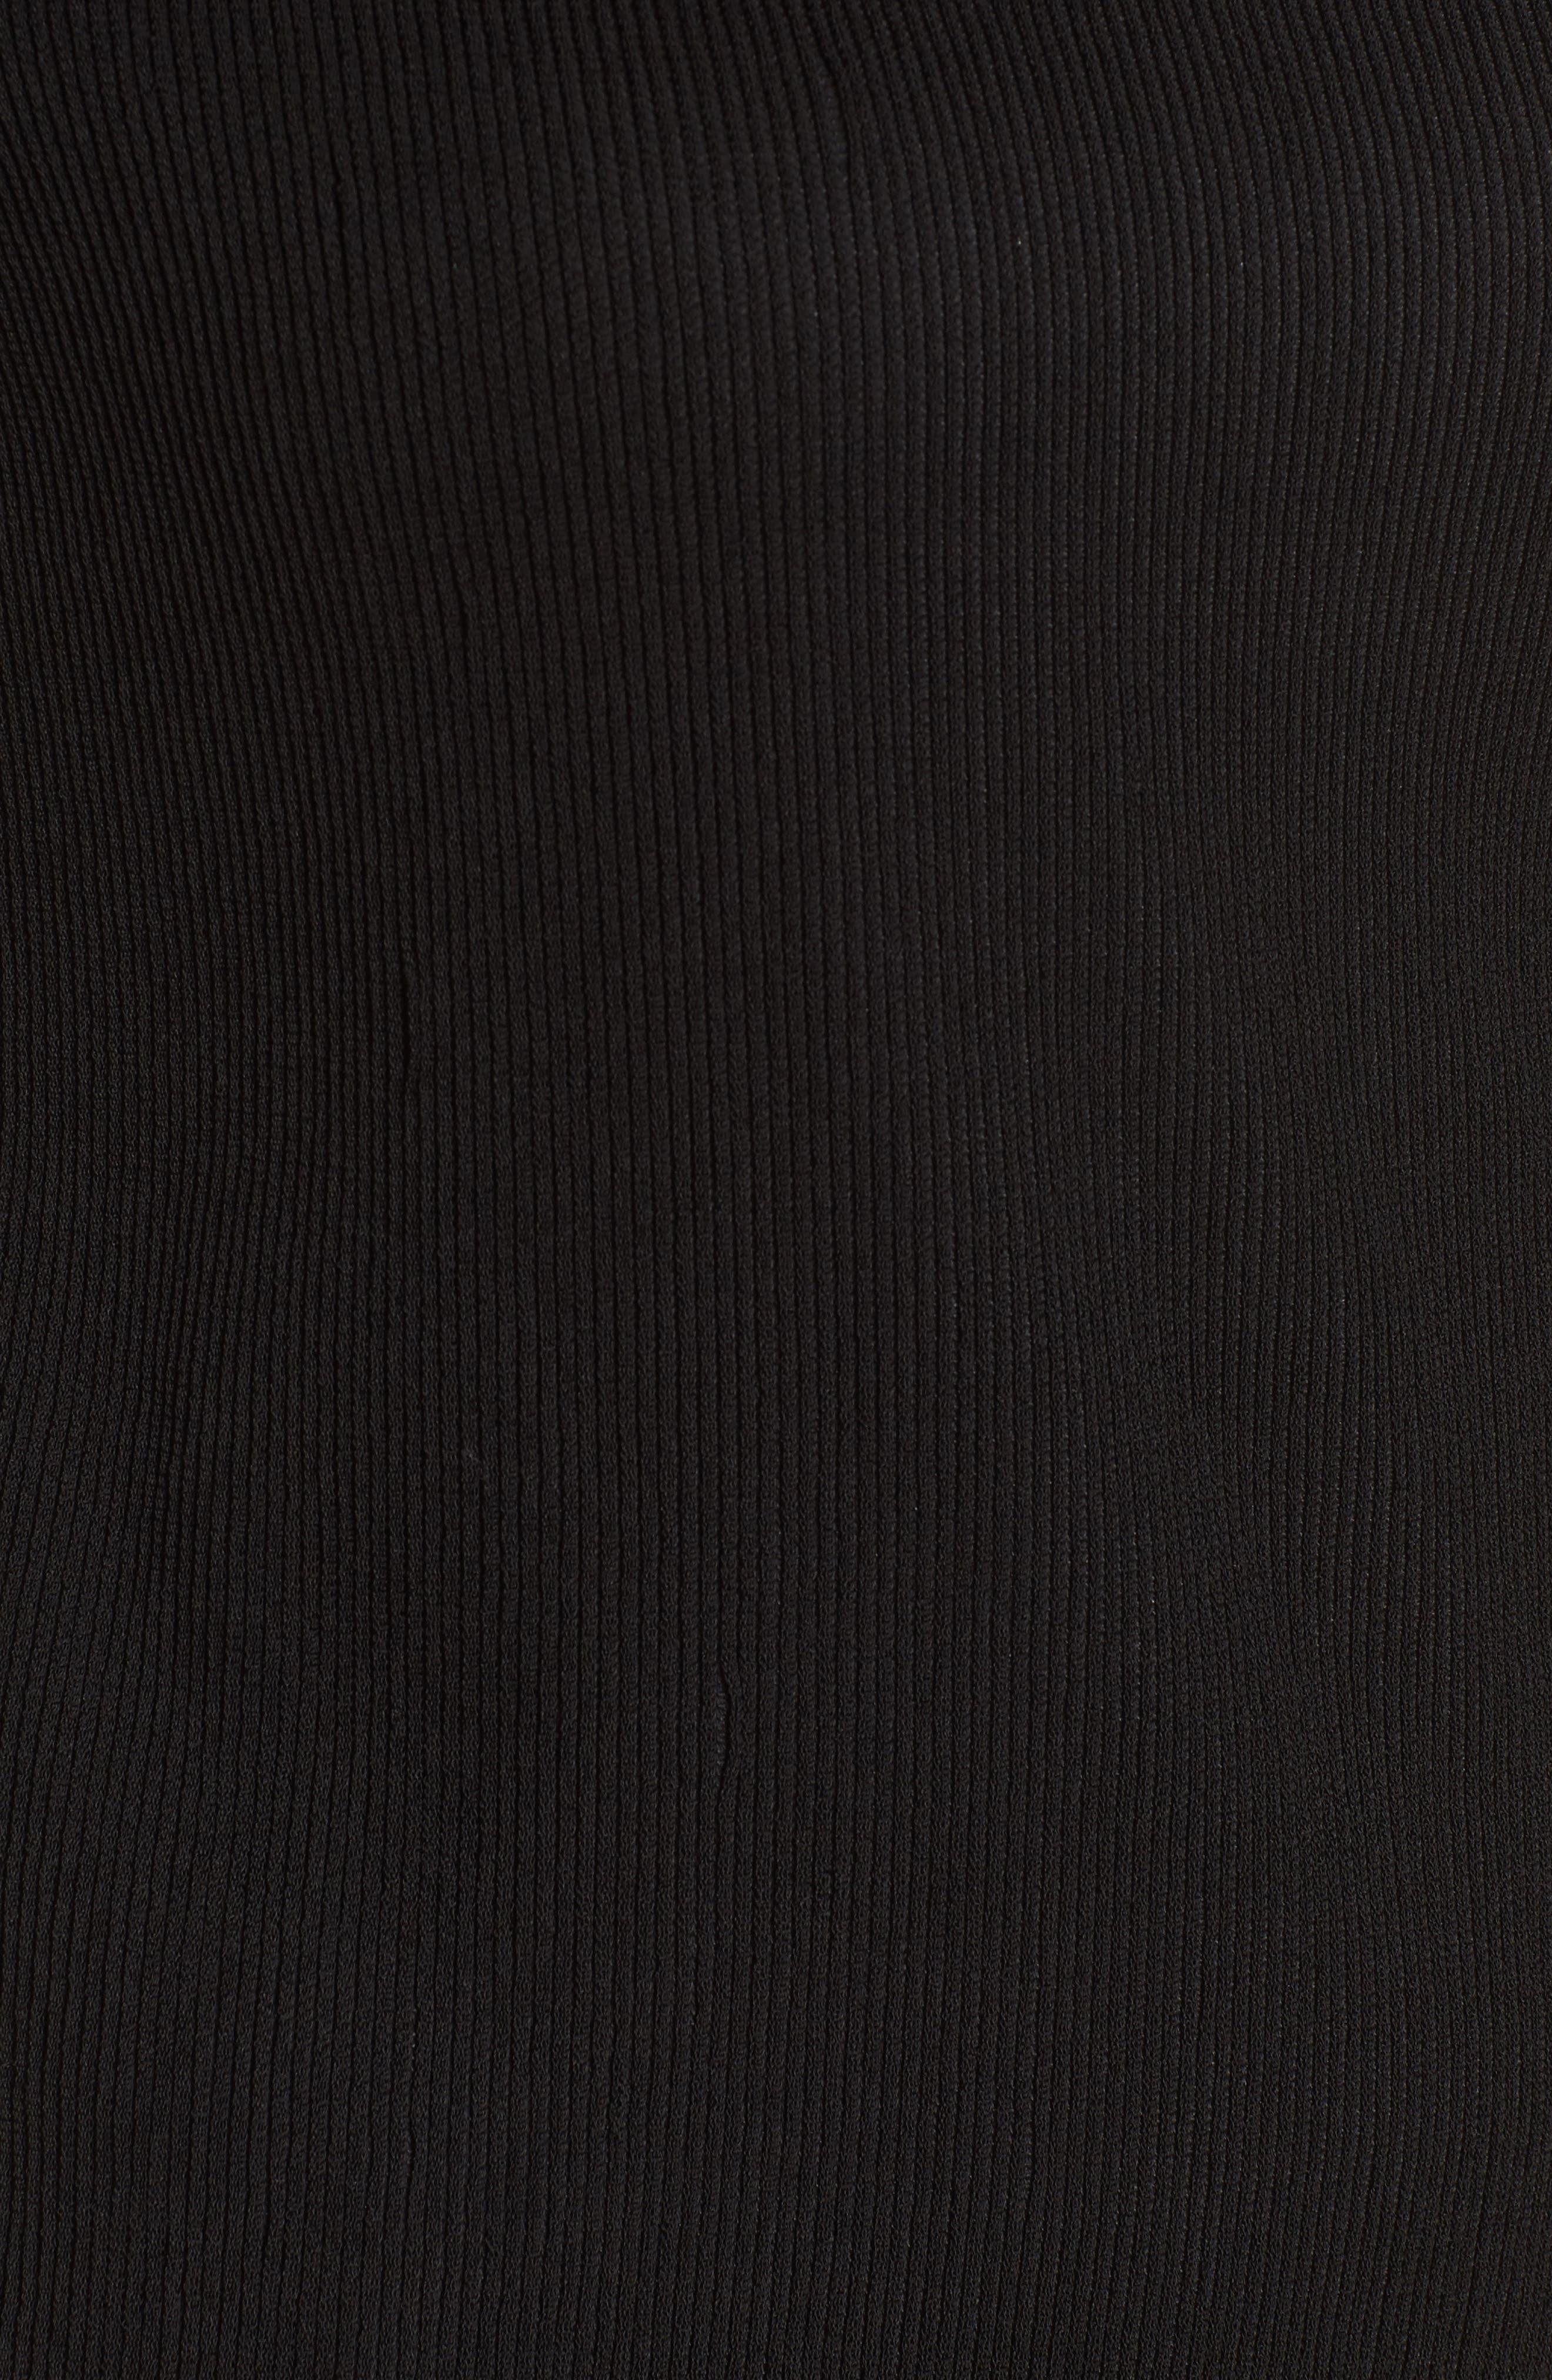 Etelina Sweater,                             Alternate thumbnail 5, color,                             001